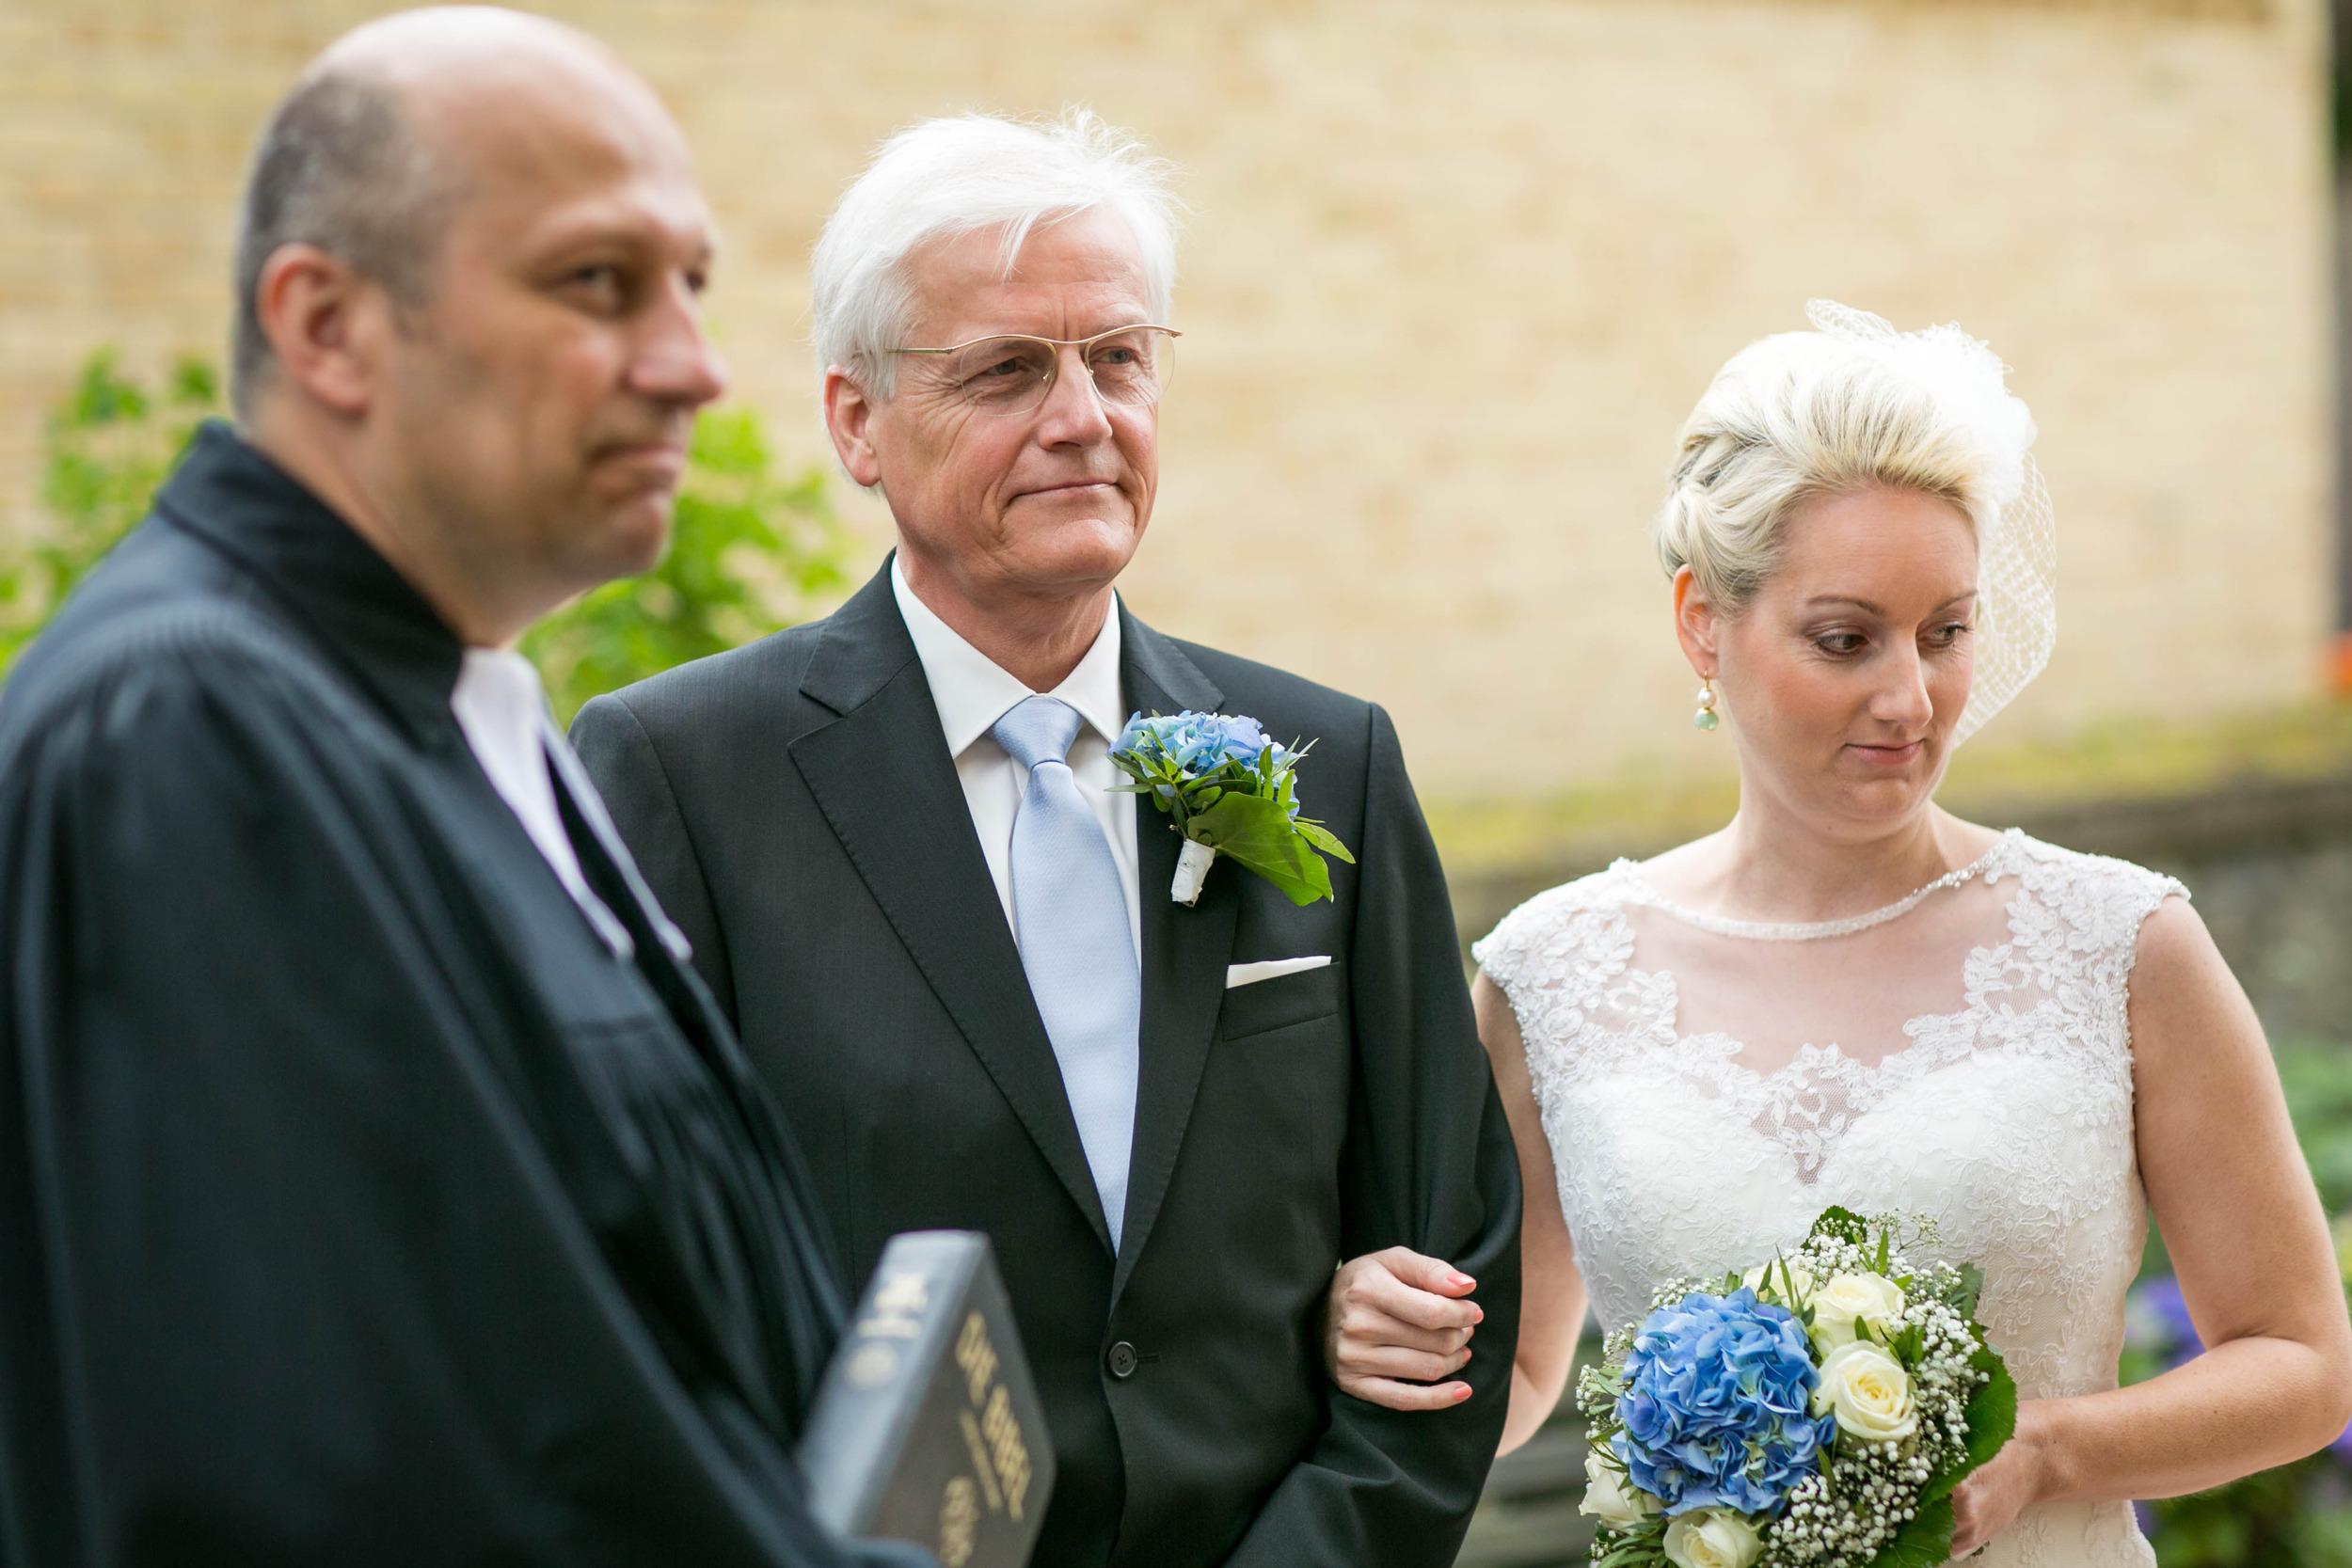 Hochzeitsfotografie Berlin_Fran Burrows Fotografie_10.jpg